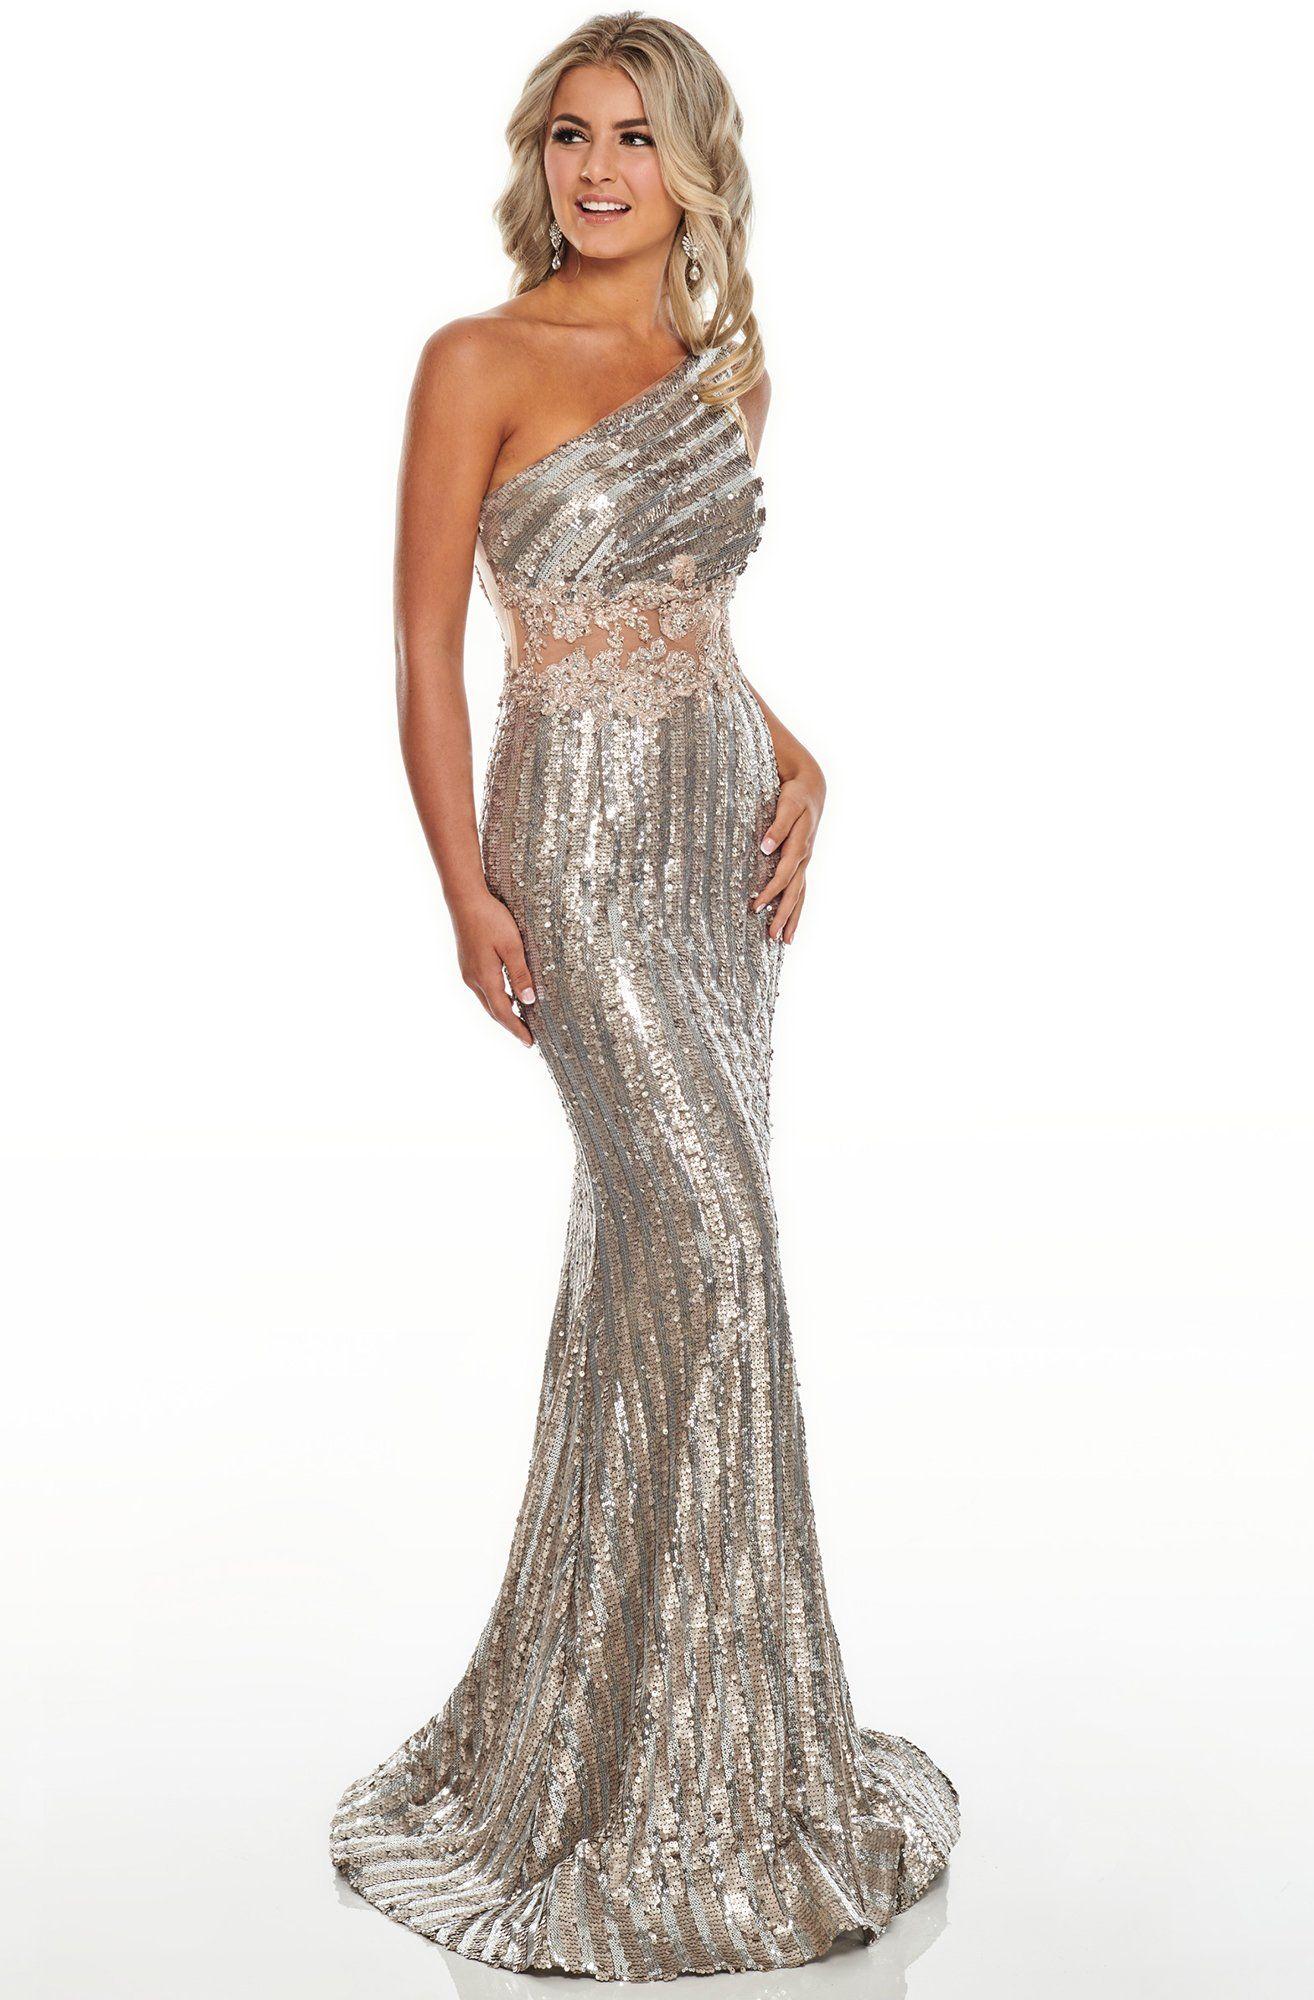 Rachel Allan Prom 7121 Asymmetrical Sequined Trumpet Dress Rachel Allan Dresses Dresses Rachel Allan Prom Dresses [ 2000 x 1314 Pixel ]